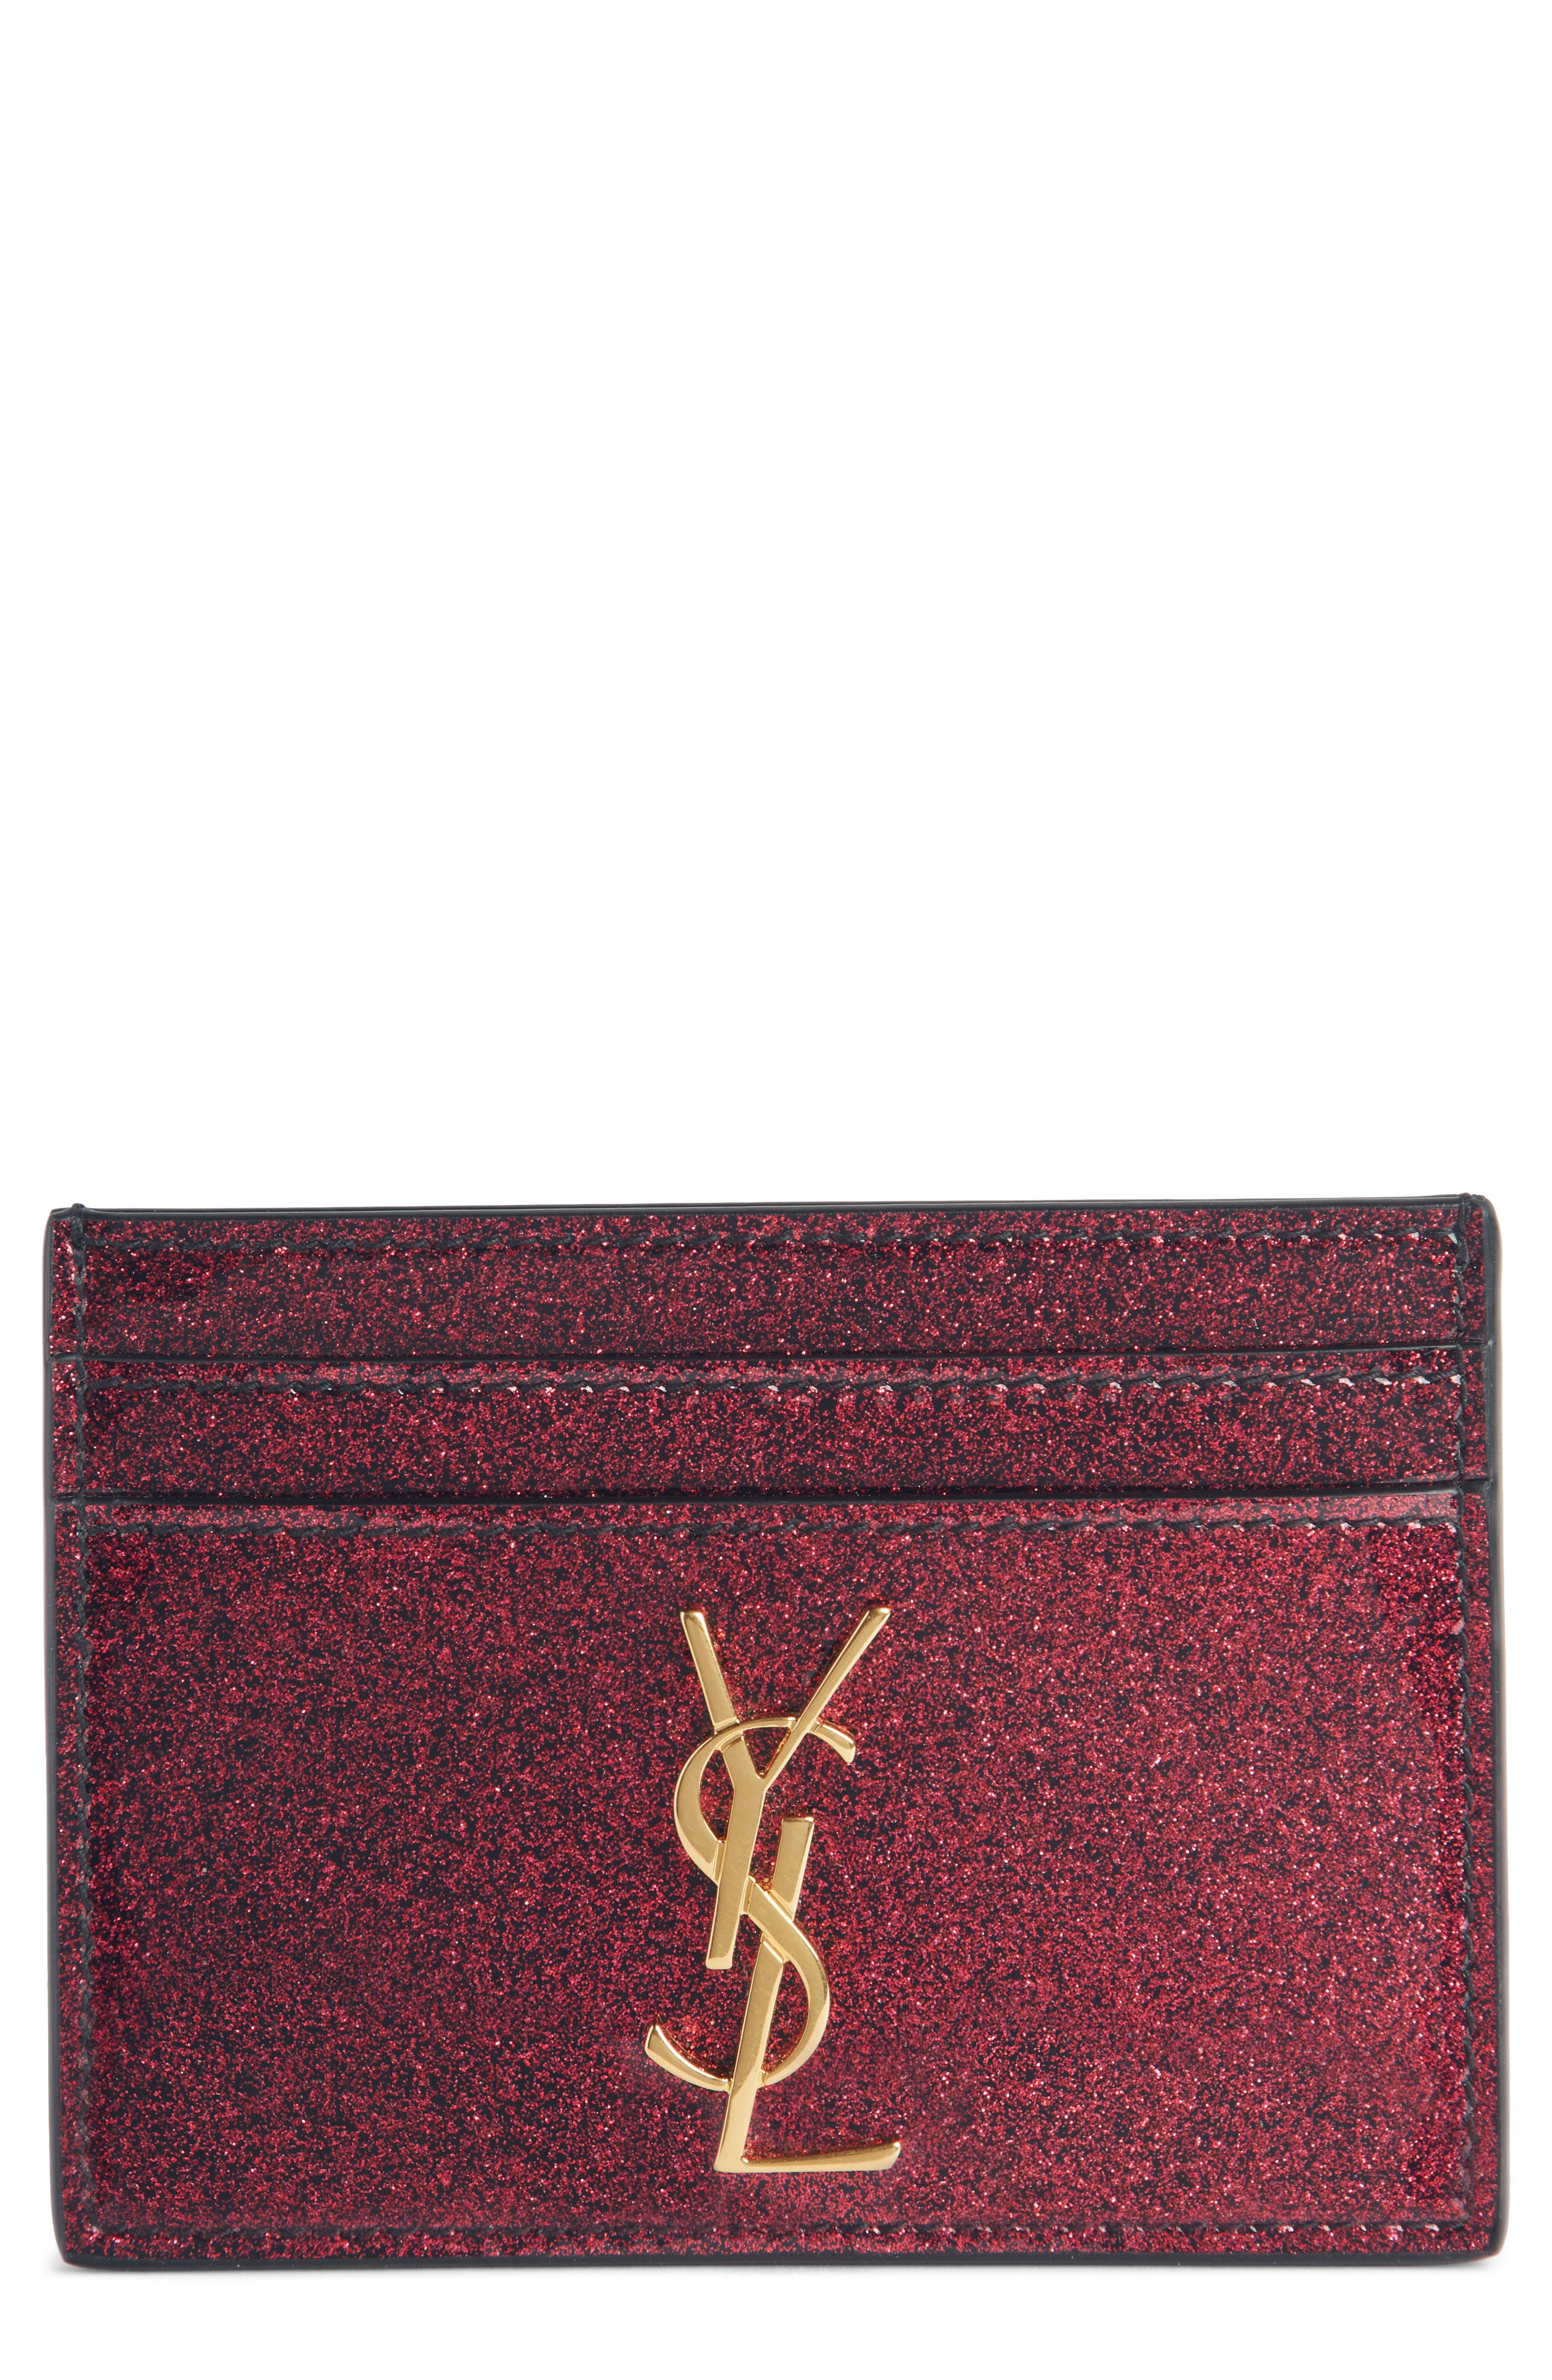 Monogram Vernis Glitter Calfskin Leather Card Case,                             Main thumbnail 1, color,                             650